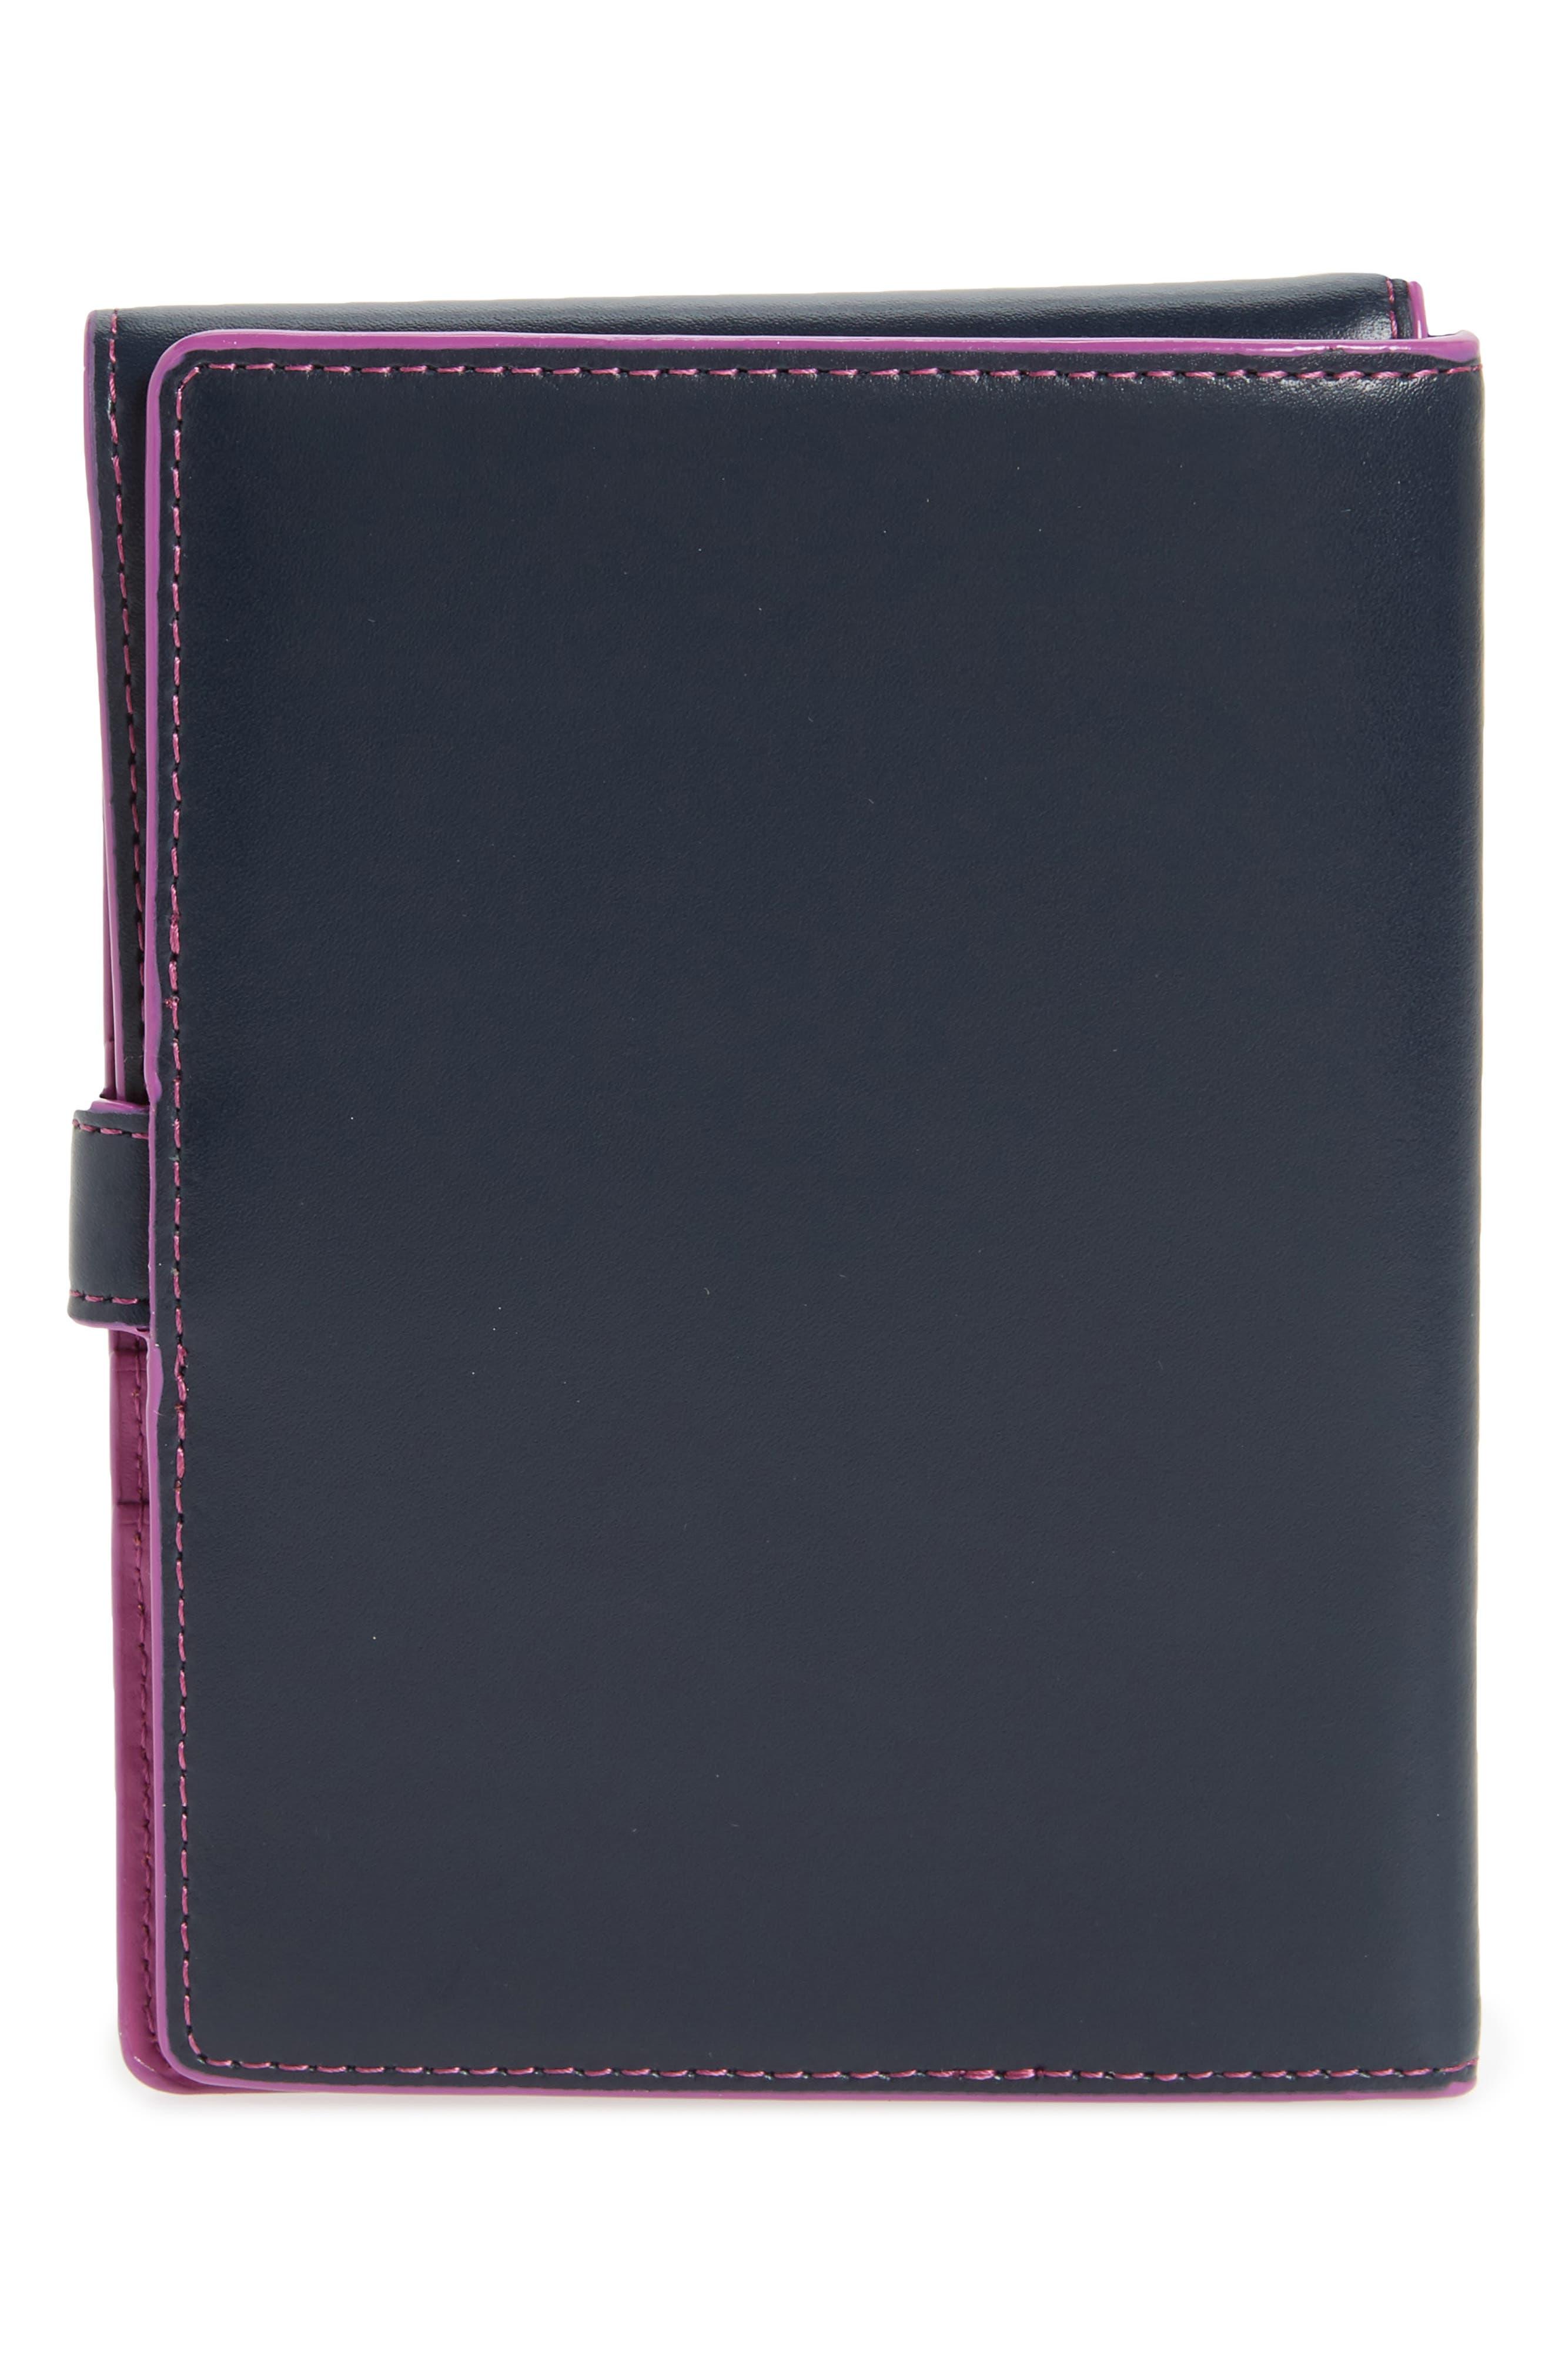 Audrey RFID Leather Passport Wallet,                             Alternate thumbnail 22, color,